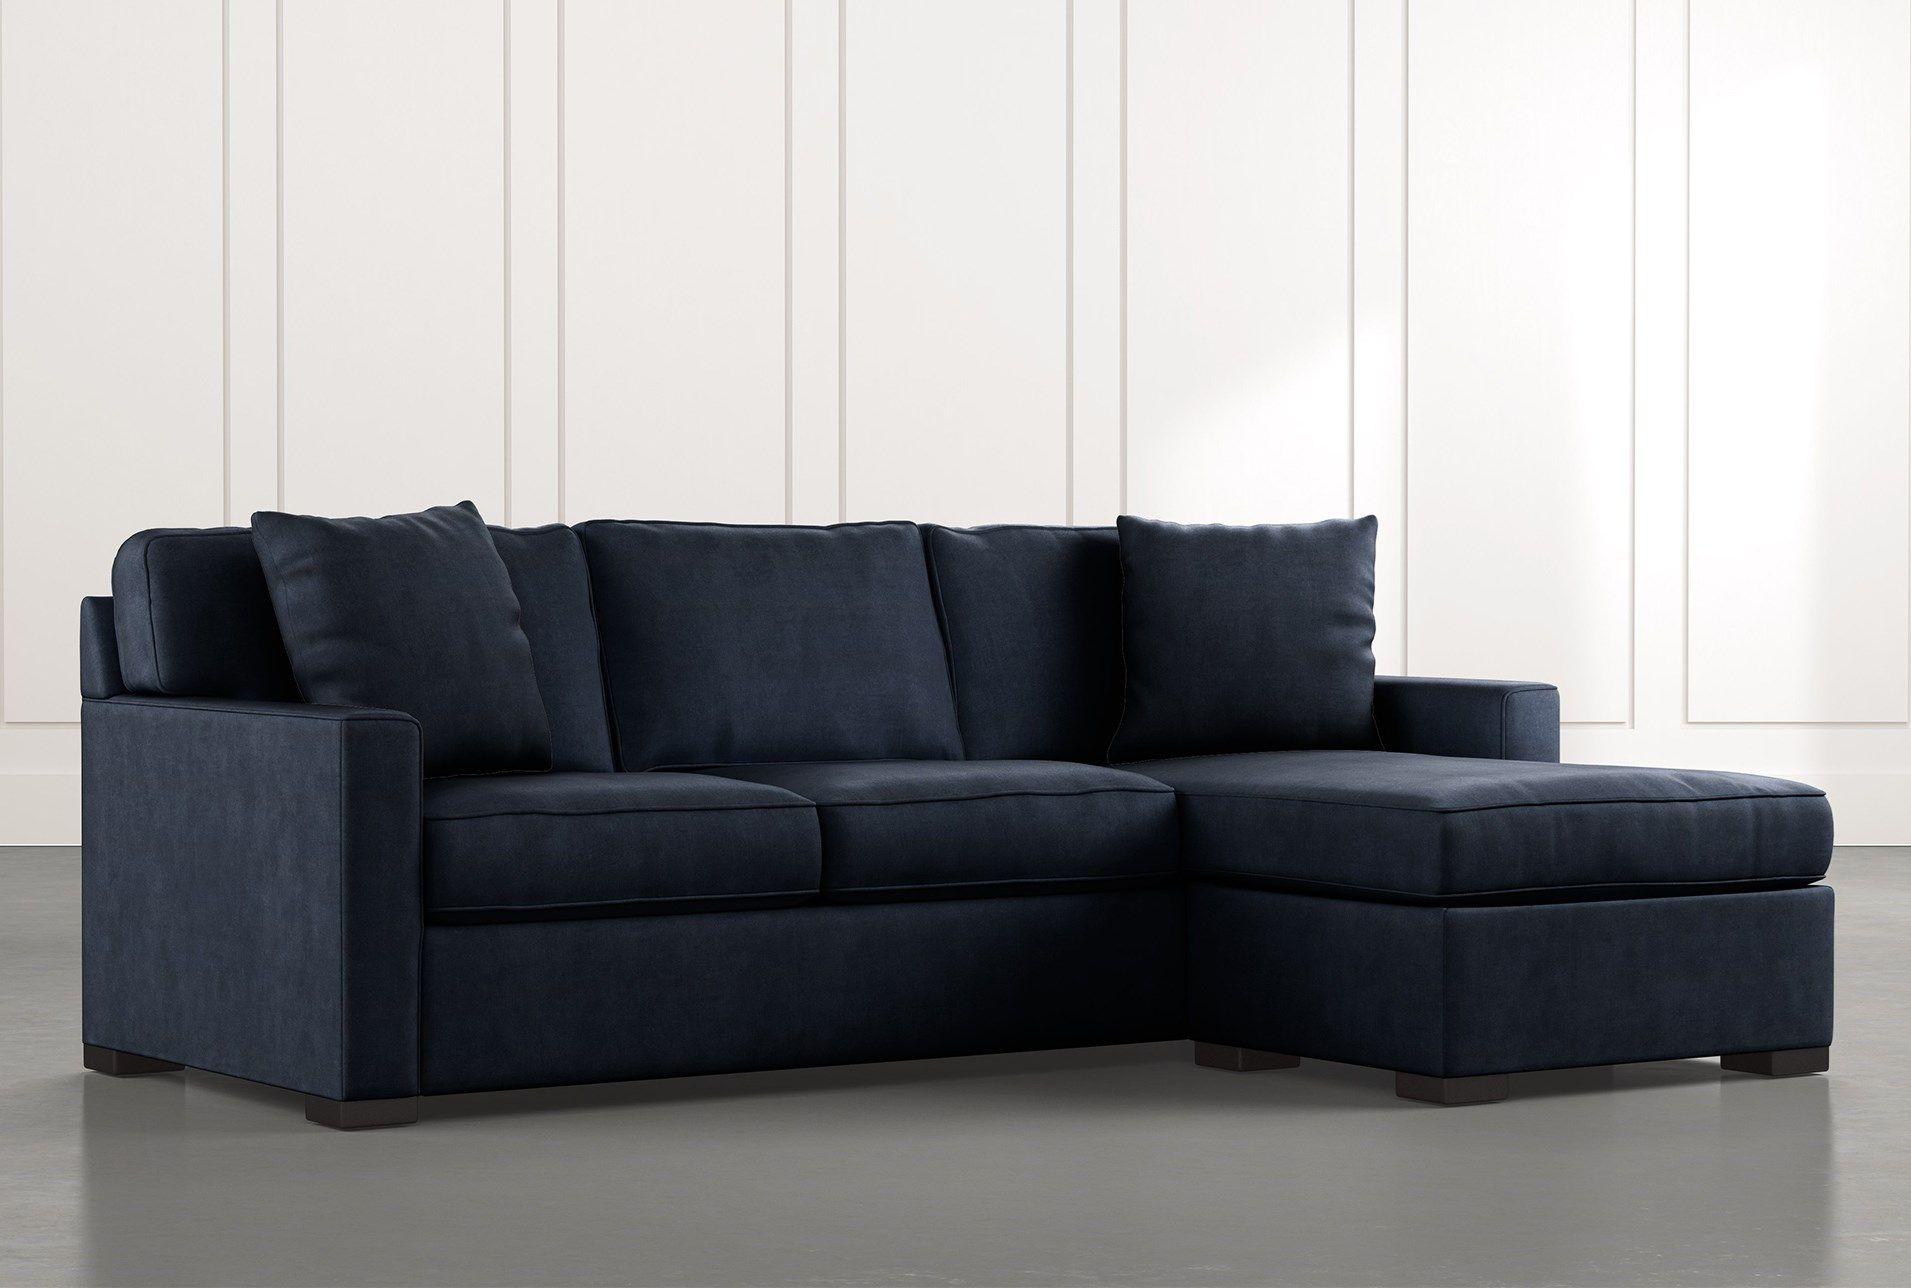 Taren Ii Navy Blue Reversible Sofa Chaise Sleeper W Storage Ottoman In 2020 Chaise Sofa Storage Ottoman Sectional Sofa